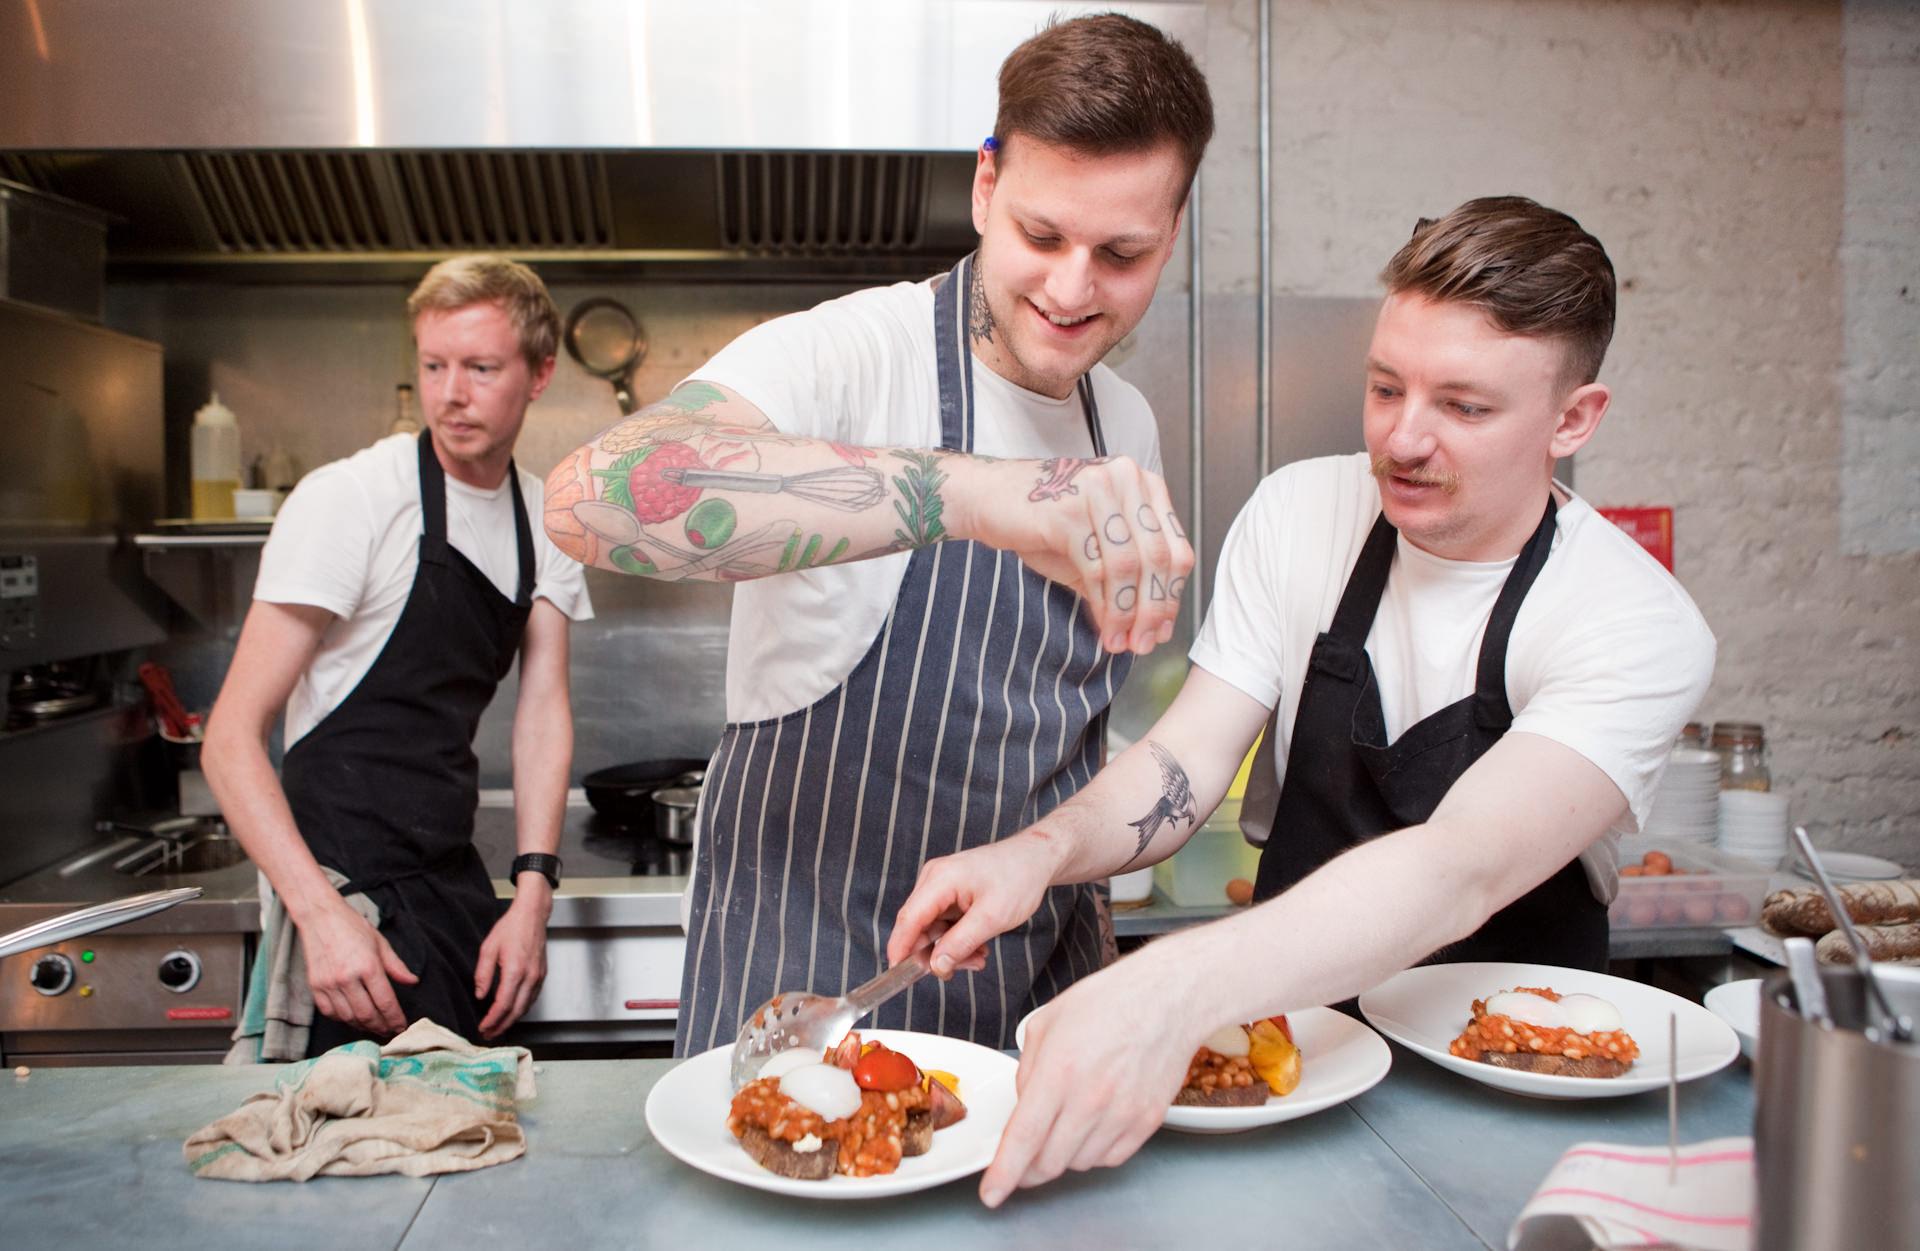 L-R; Head Chef, Kim Sheppard, Blair Hammond and James Mcilveen prepare food in the service kitchen.